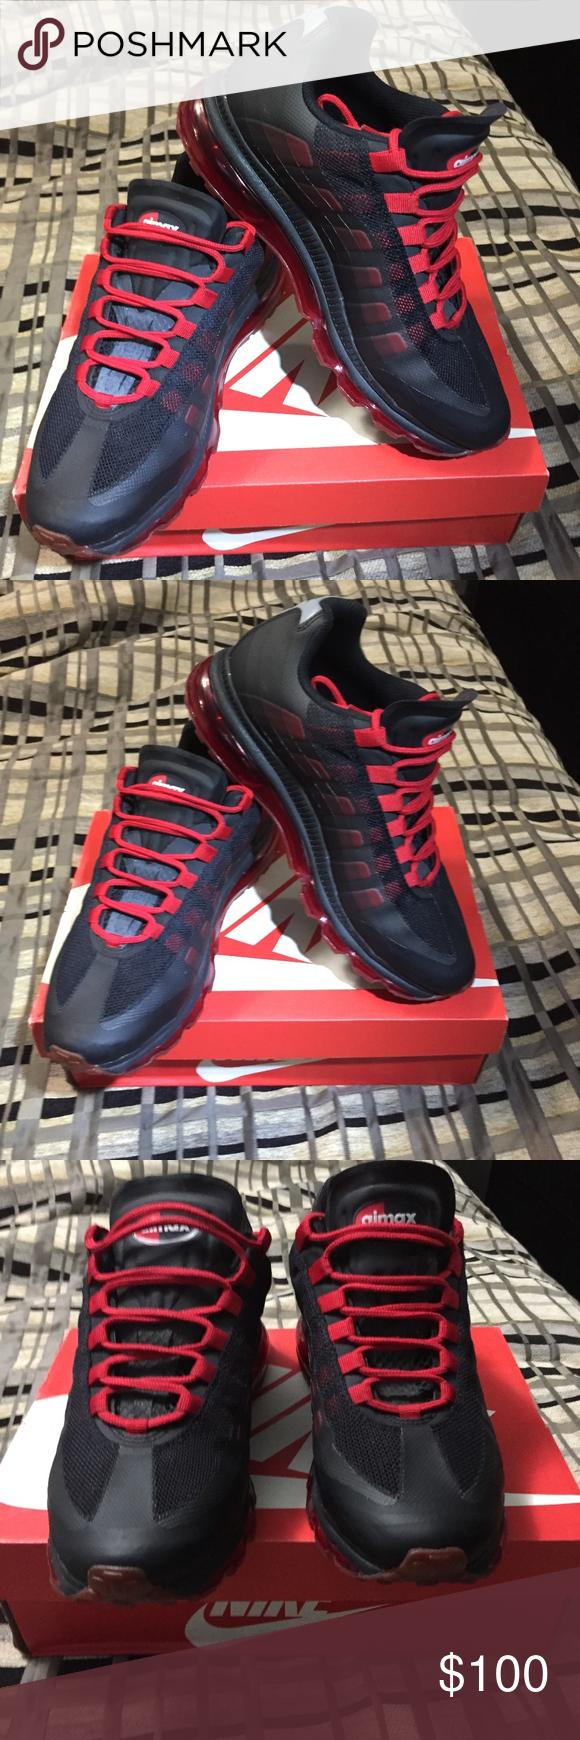 premium selection 9bd12 fc4c2 NIKE AIR MAX 95 SZ 10 NIKE BB Nike AIR MAX 95 + BLACK/SPORT RED ...